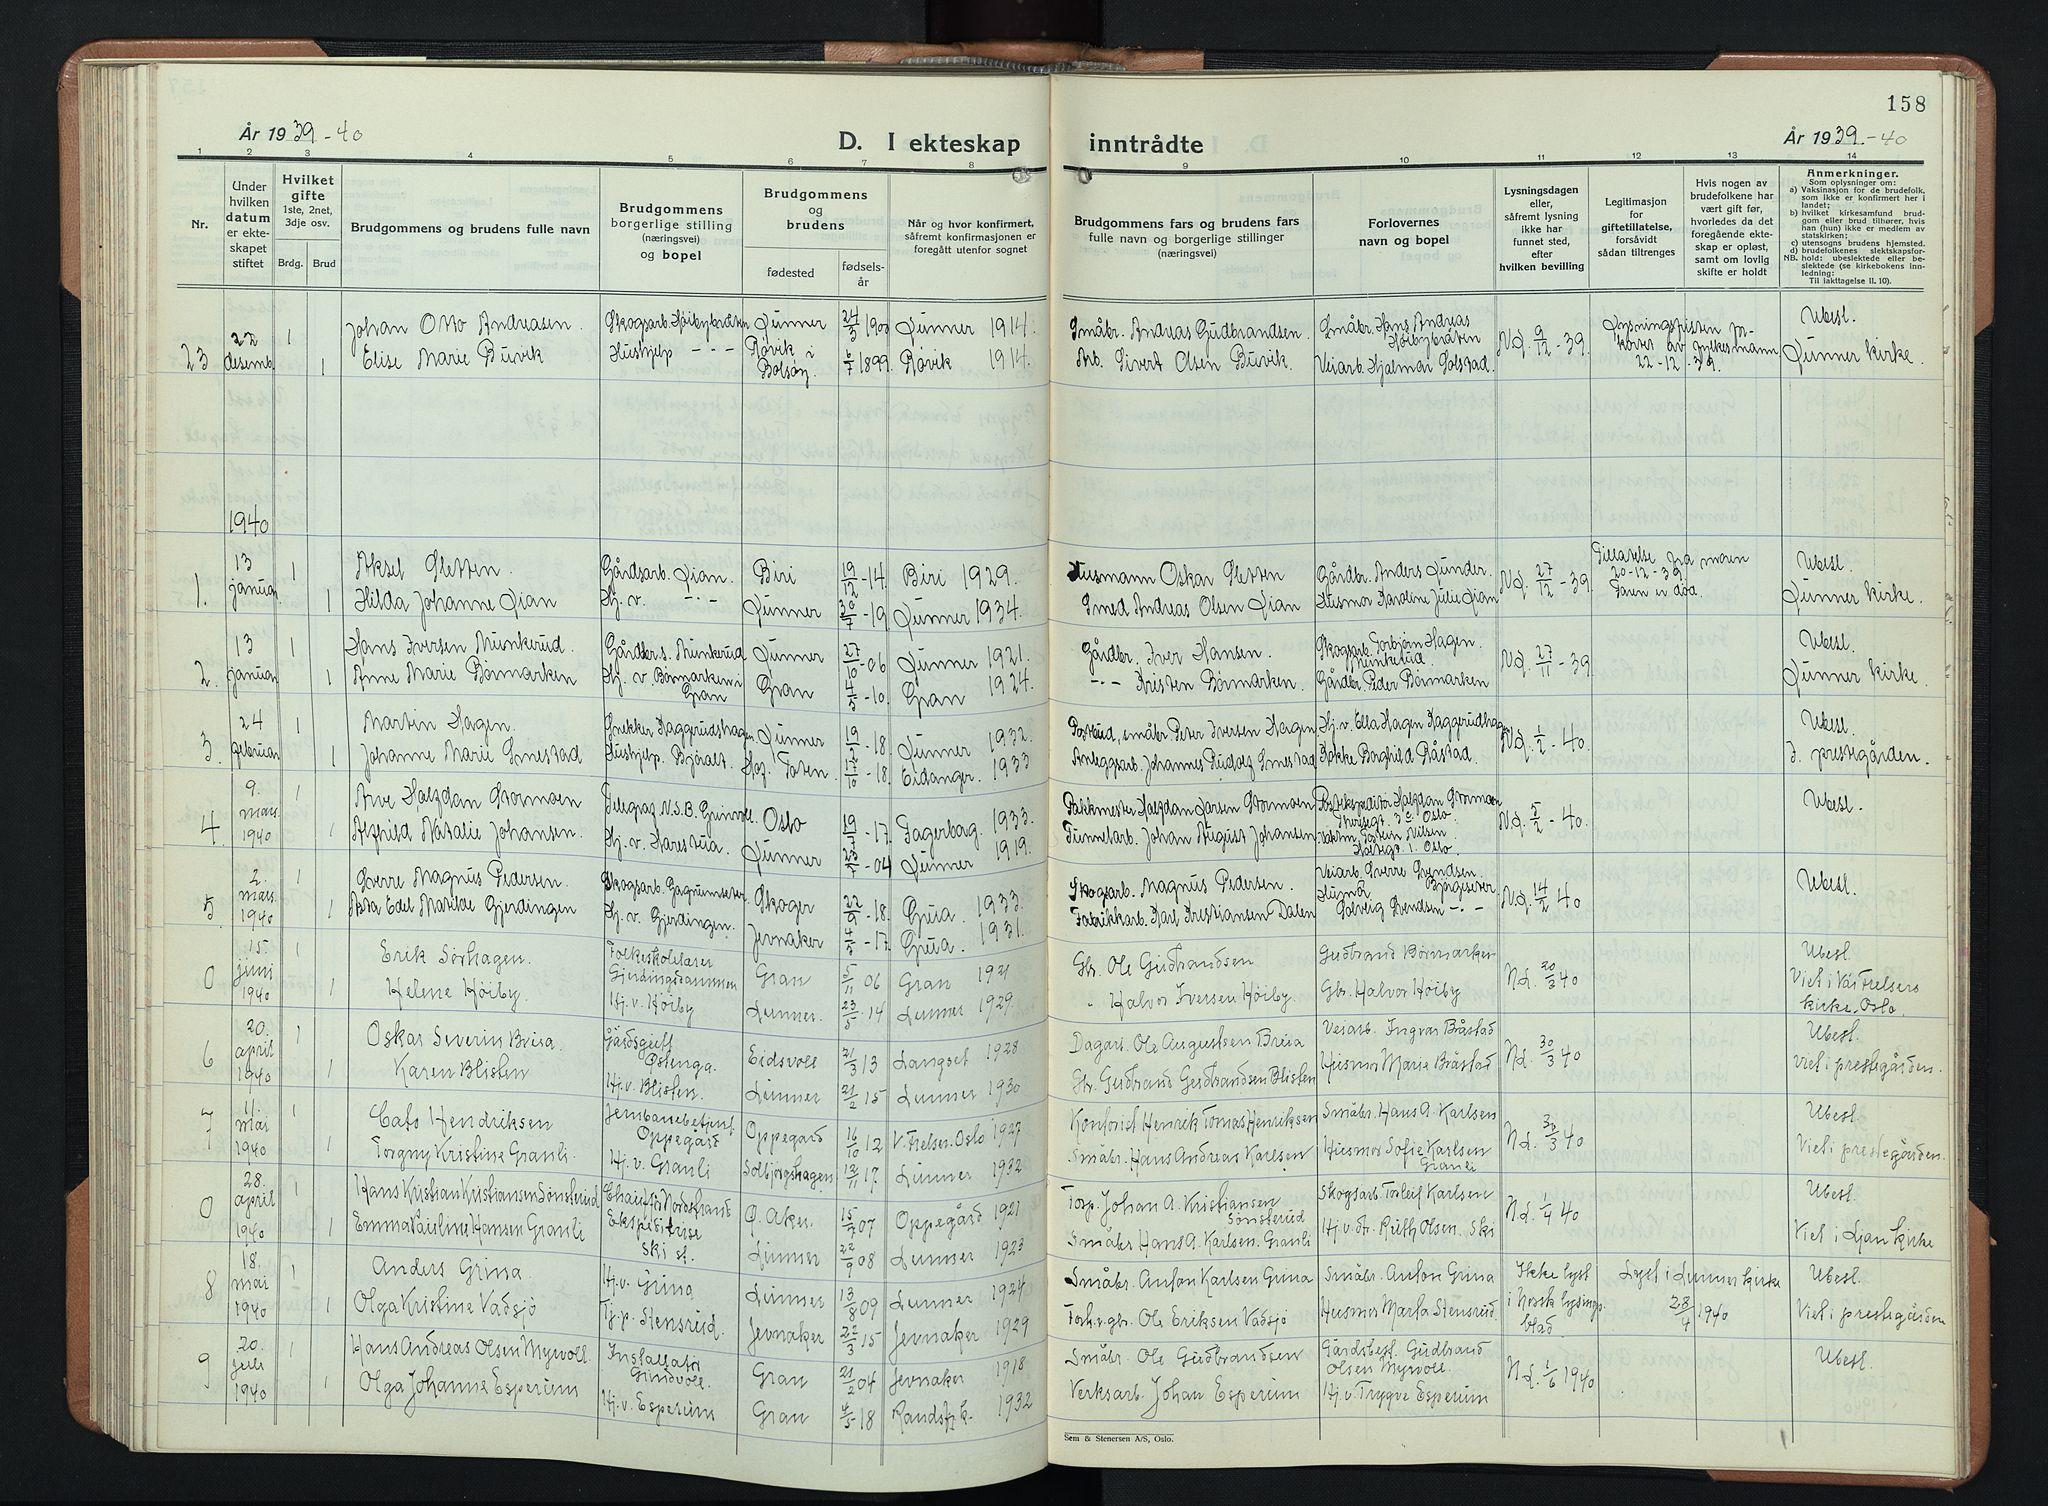 SAH, Lunner prestekontor, H/Ha/Hab/L0003: Klokkerbok nr. 3, 1933-1945, s. 158